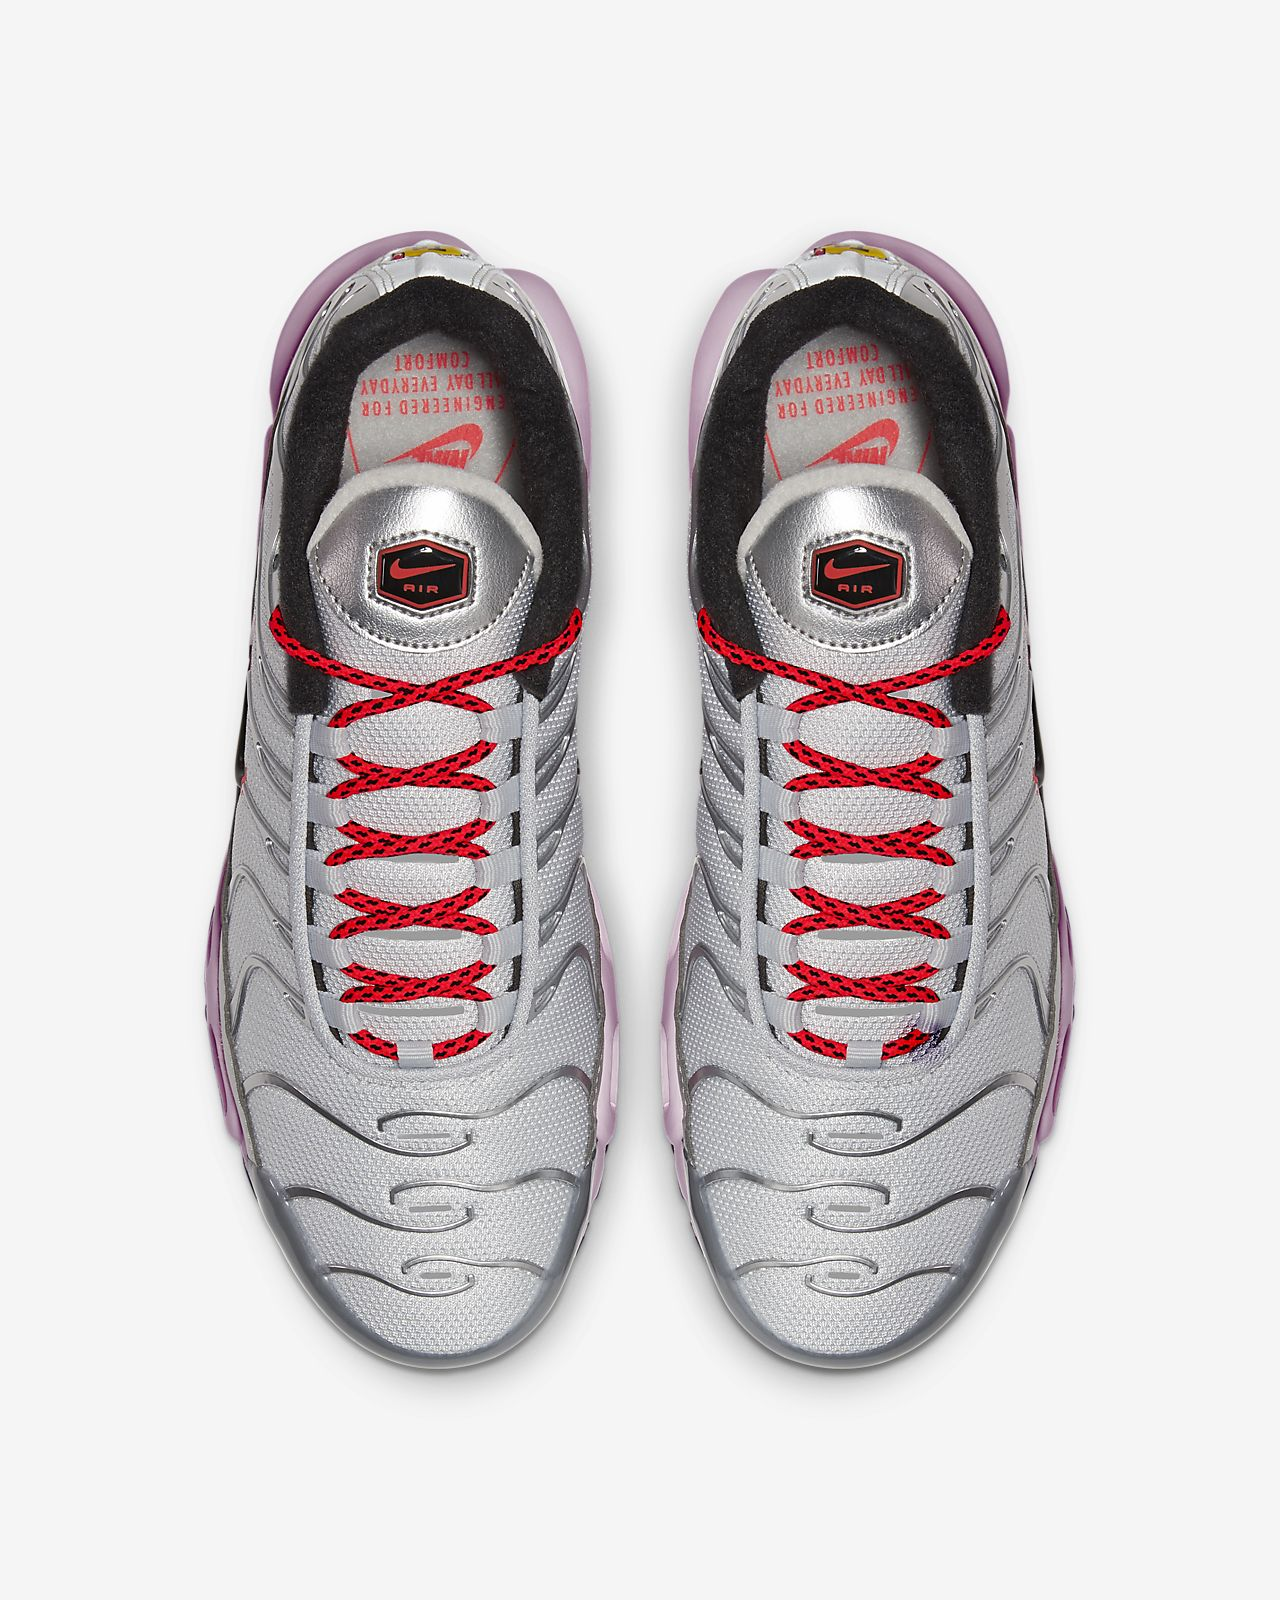 Nike Air Max Plus Premium Womens WhiteMetallic SilverBlack